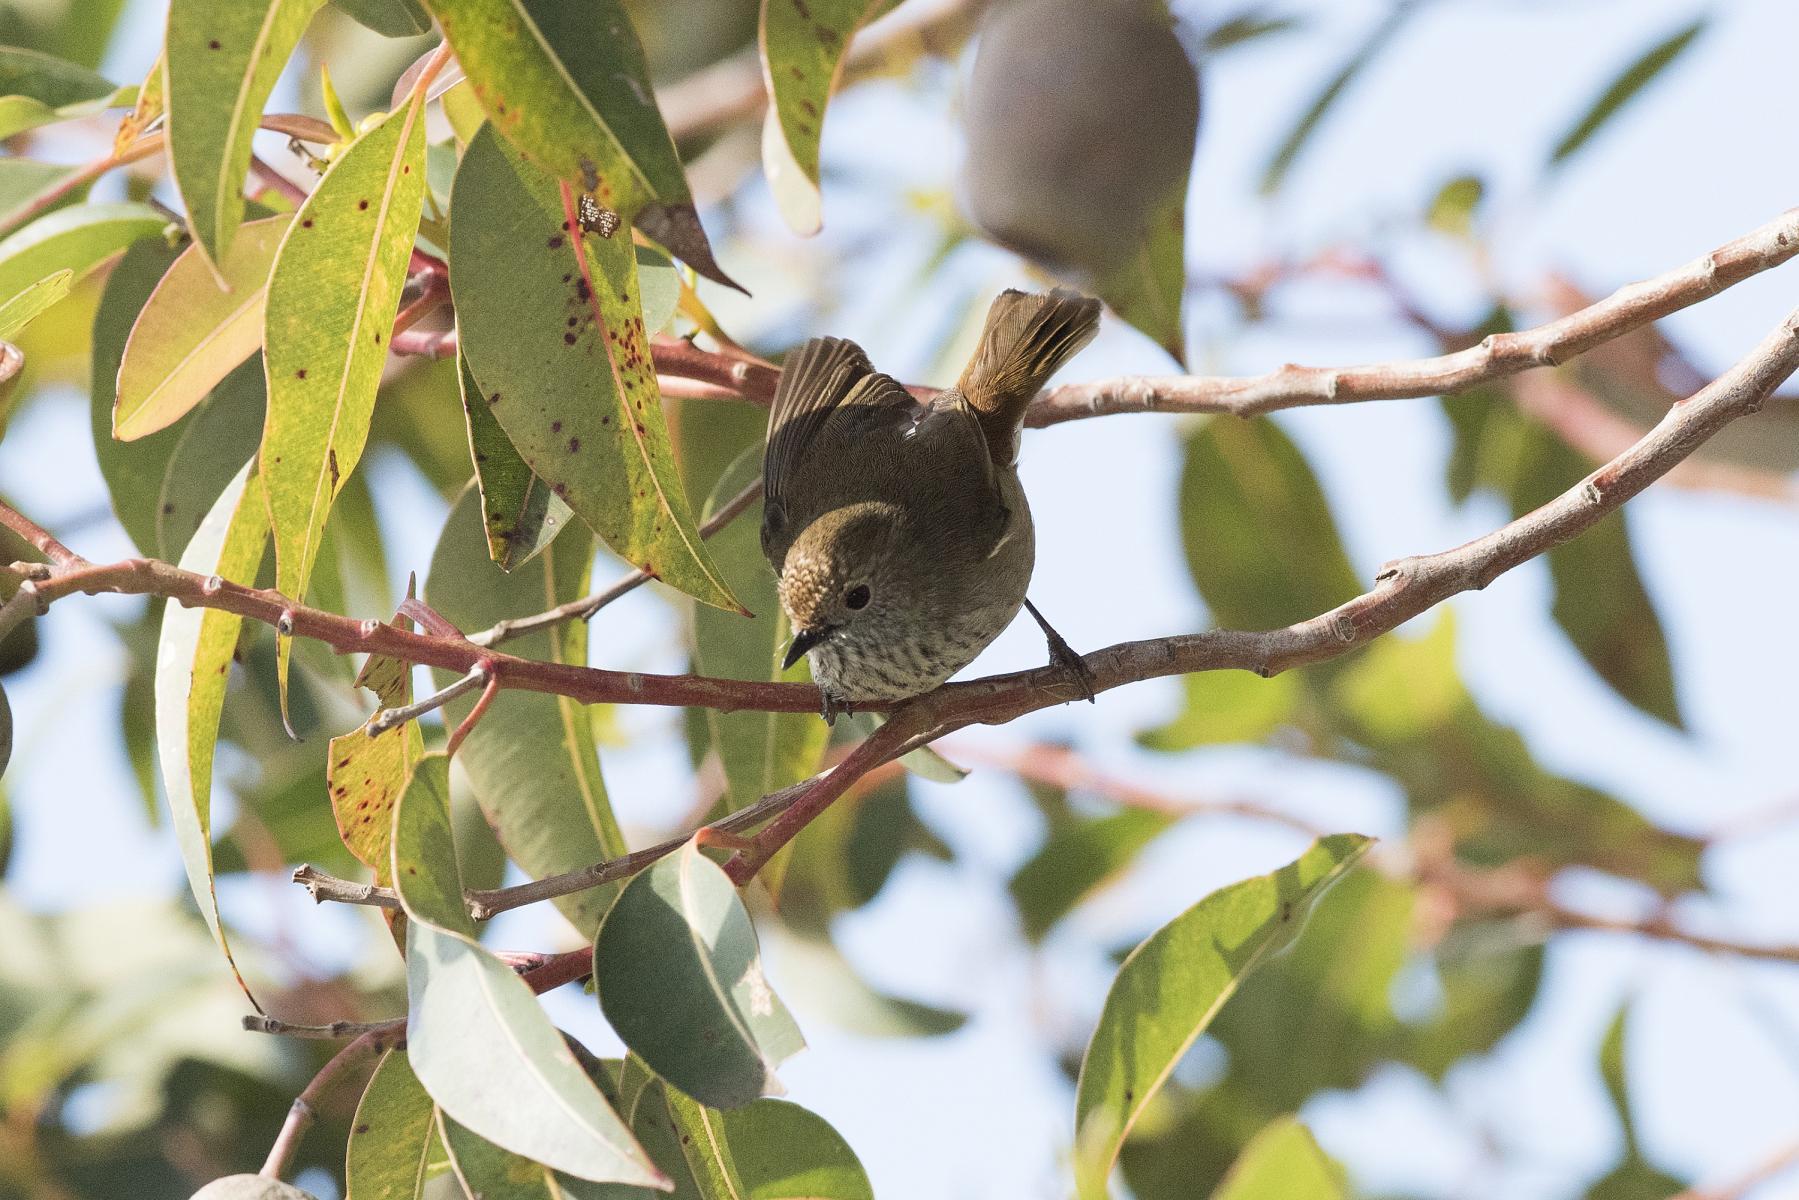 Acanthiza pusilla: brown thornbill